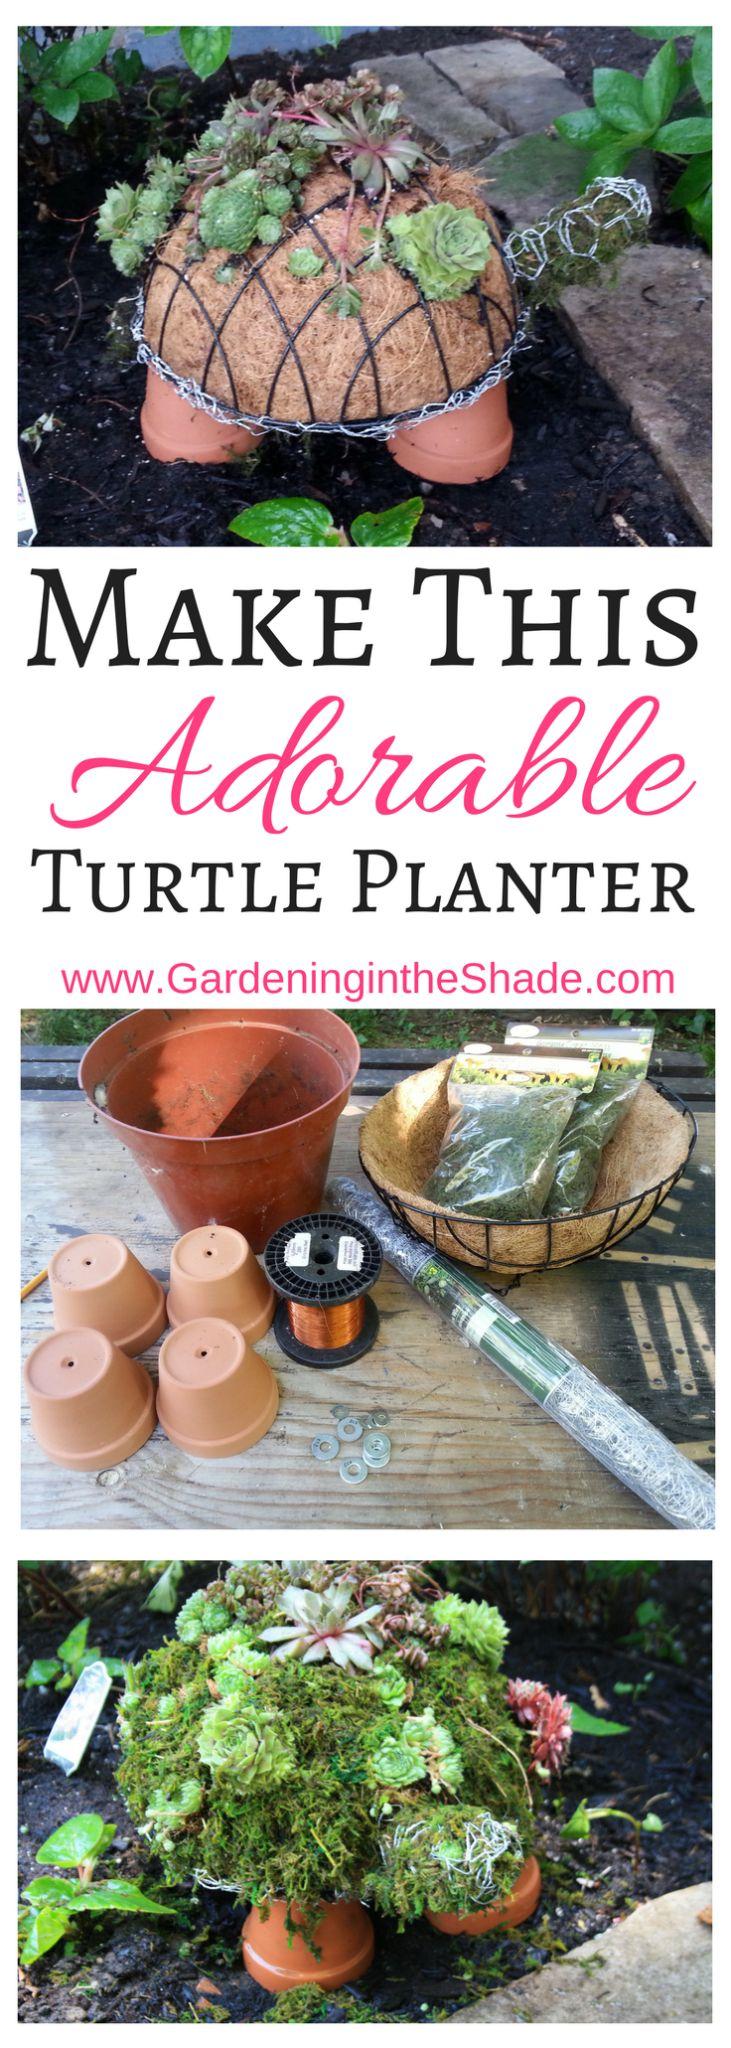 best garden tips images on pinterest apartment gardening